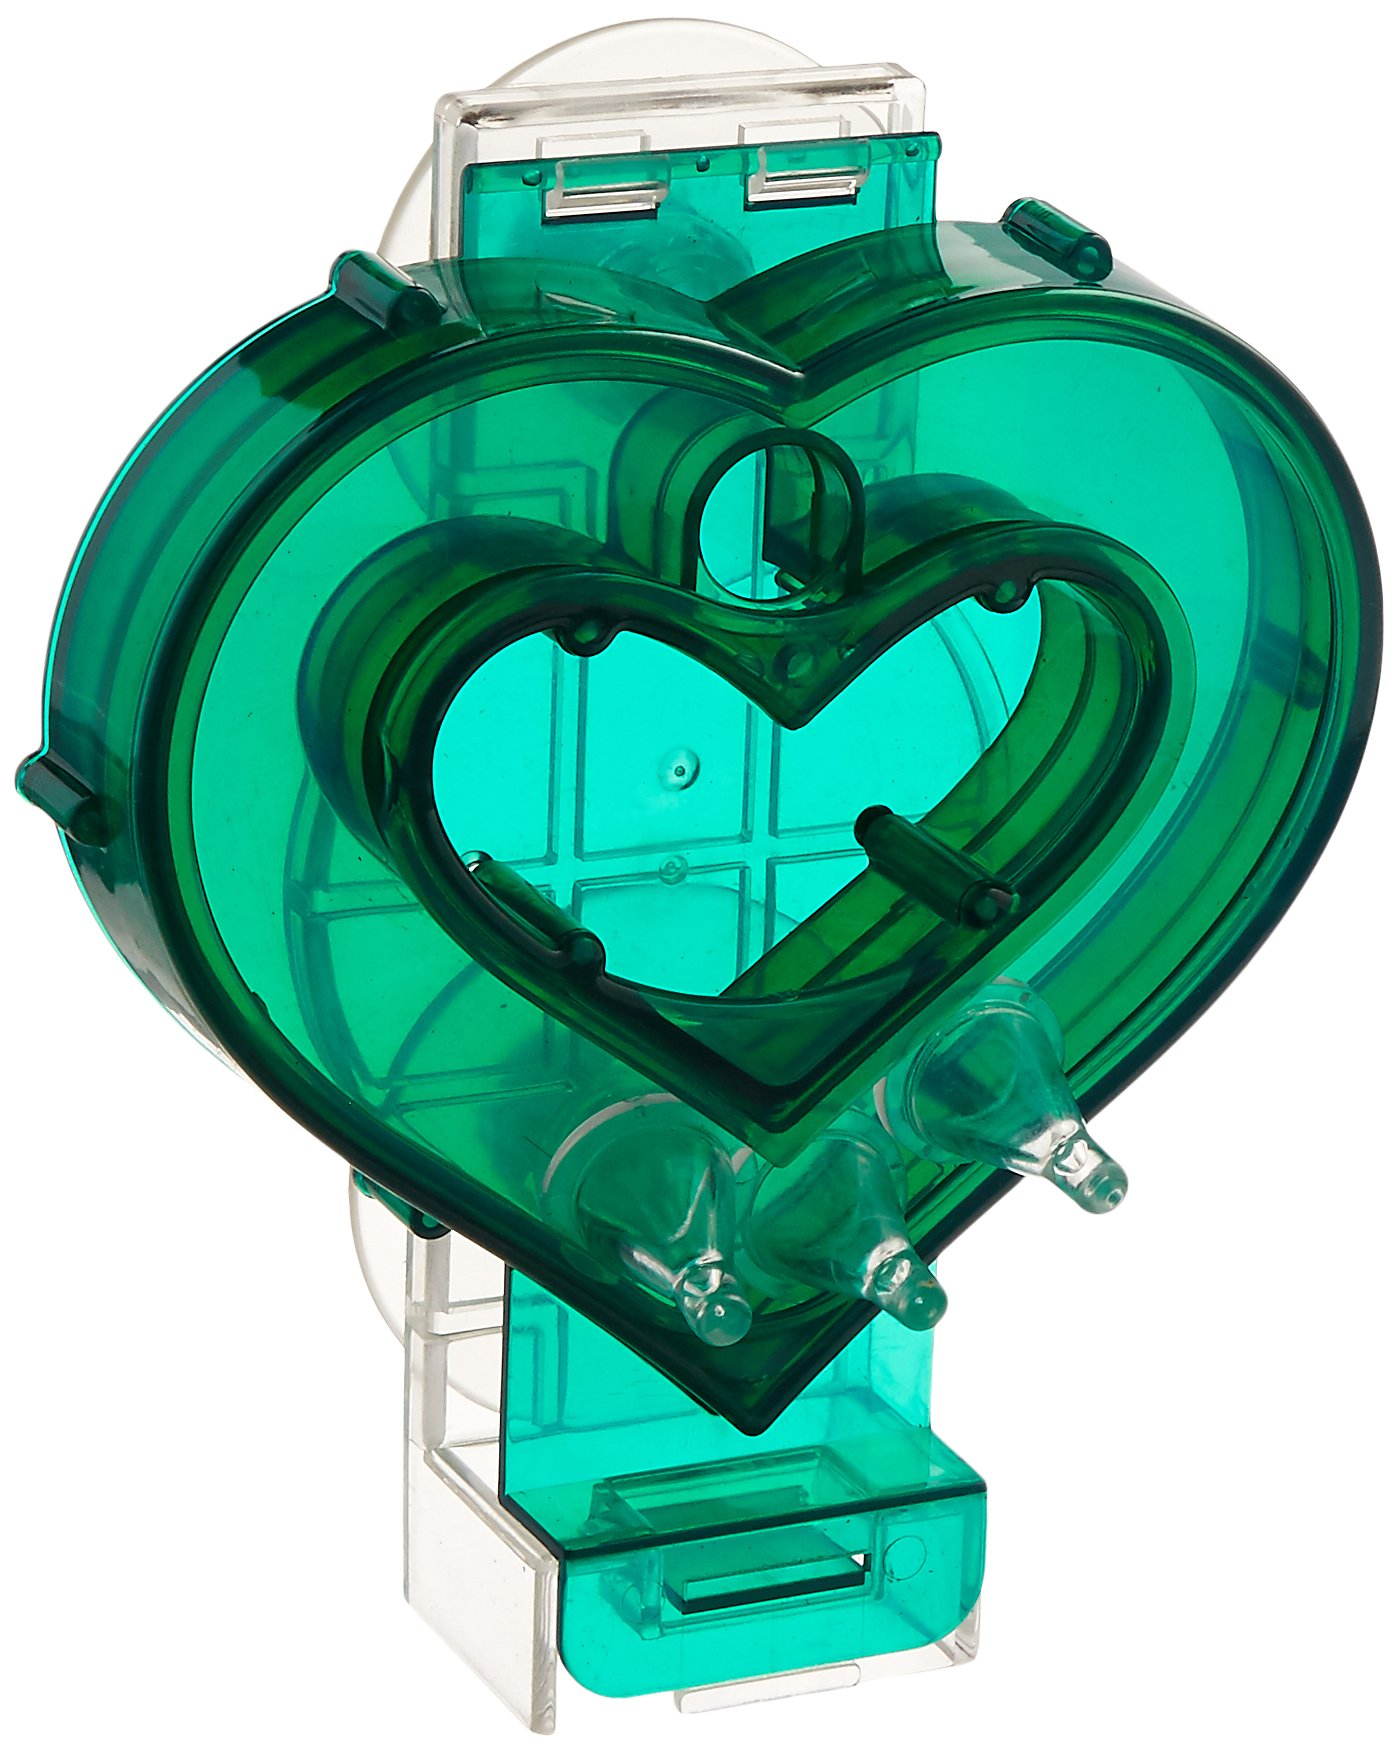 Creative Foraging Systems+E487 Mastermind Heart Pet Feeder, 7 by 8 by 3-Inch by Creative Foraging Systems+E487